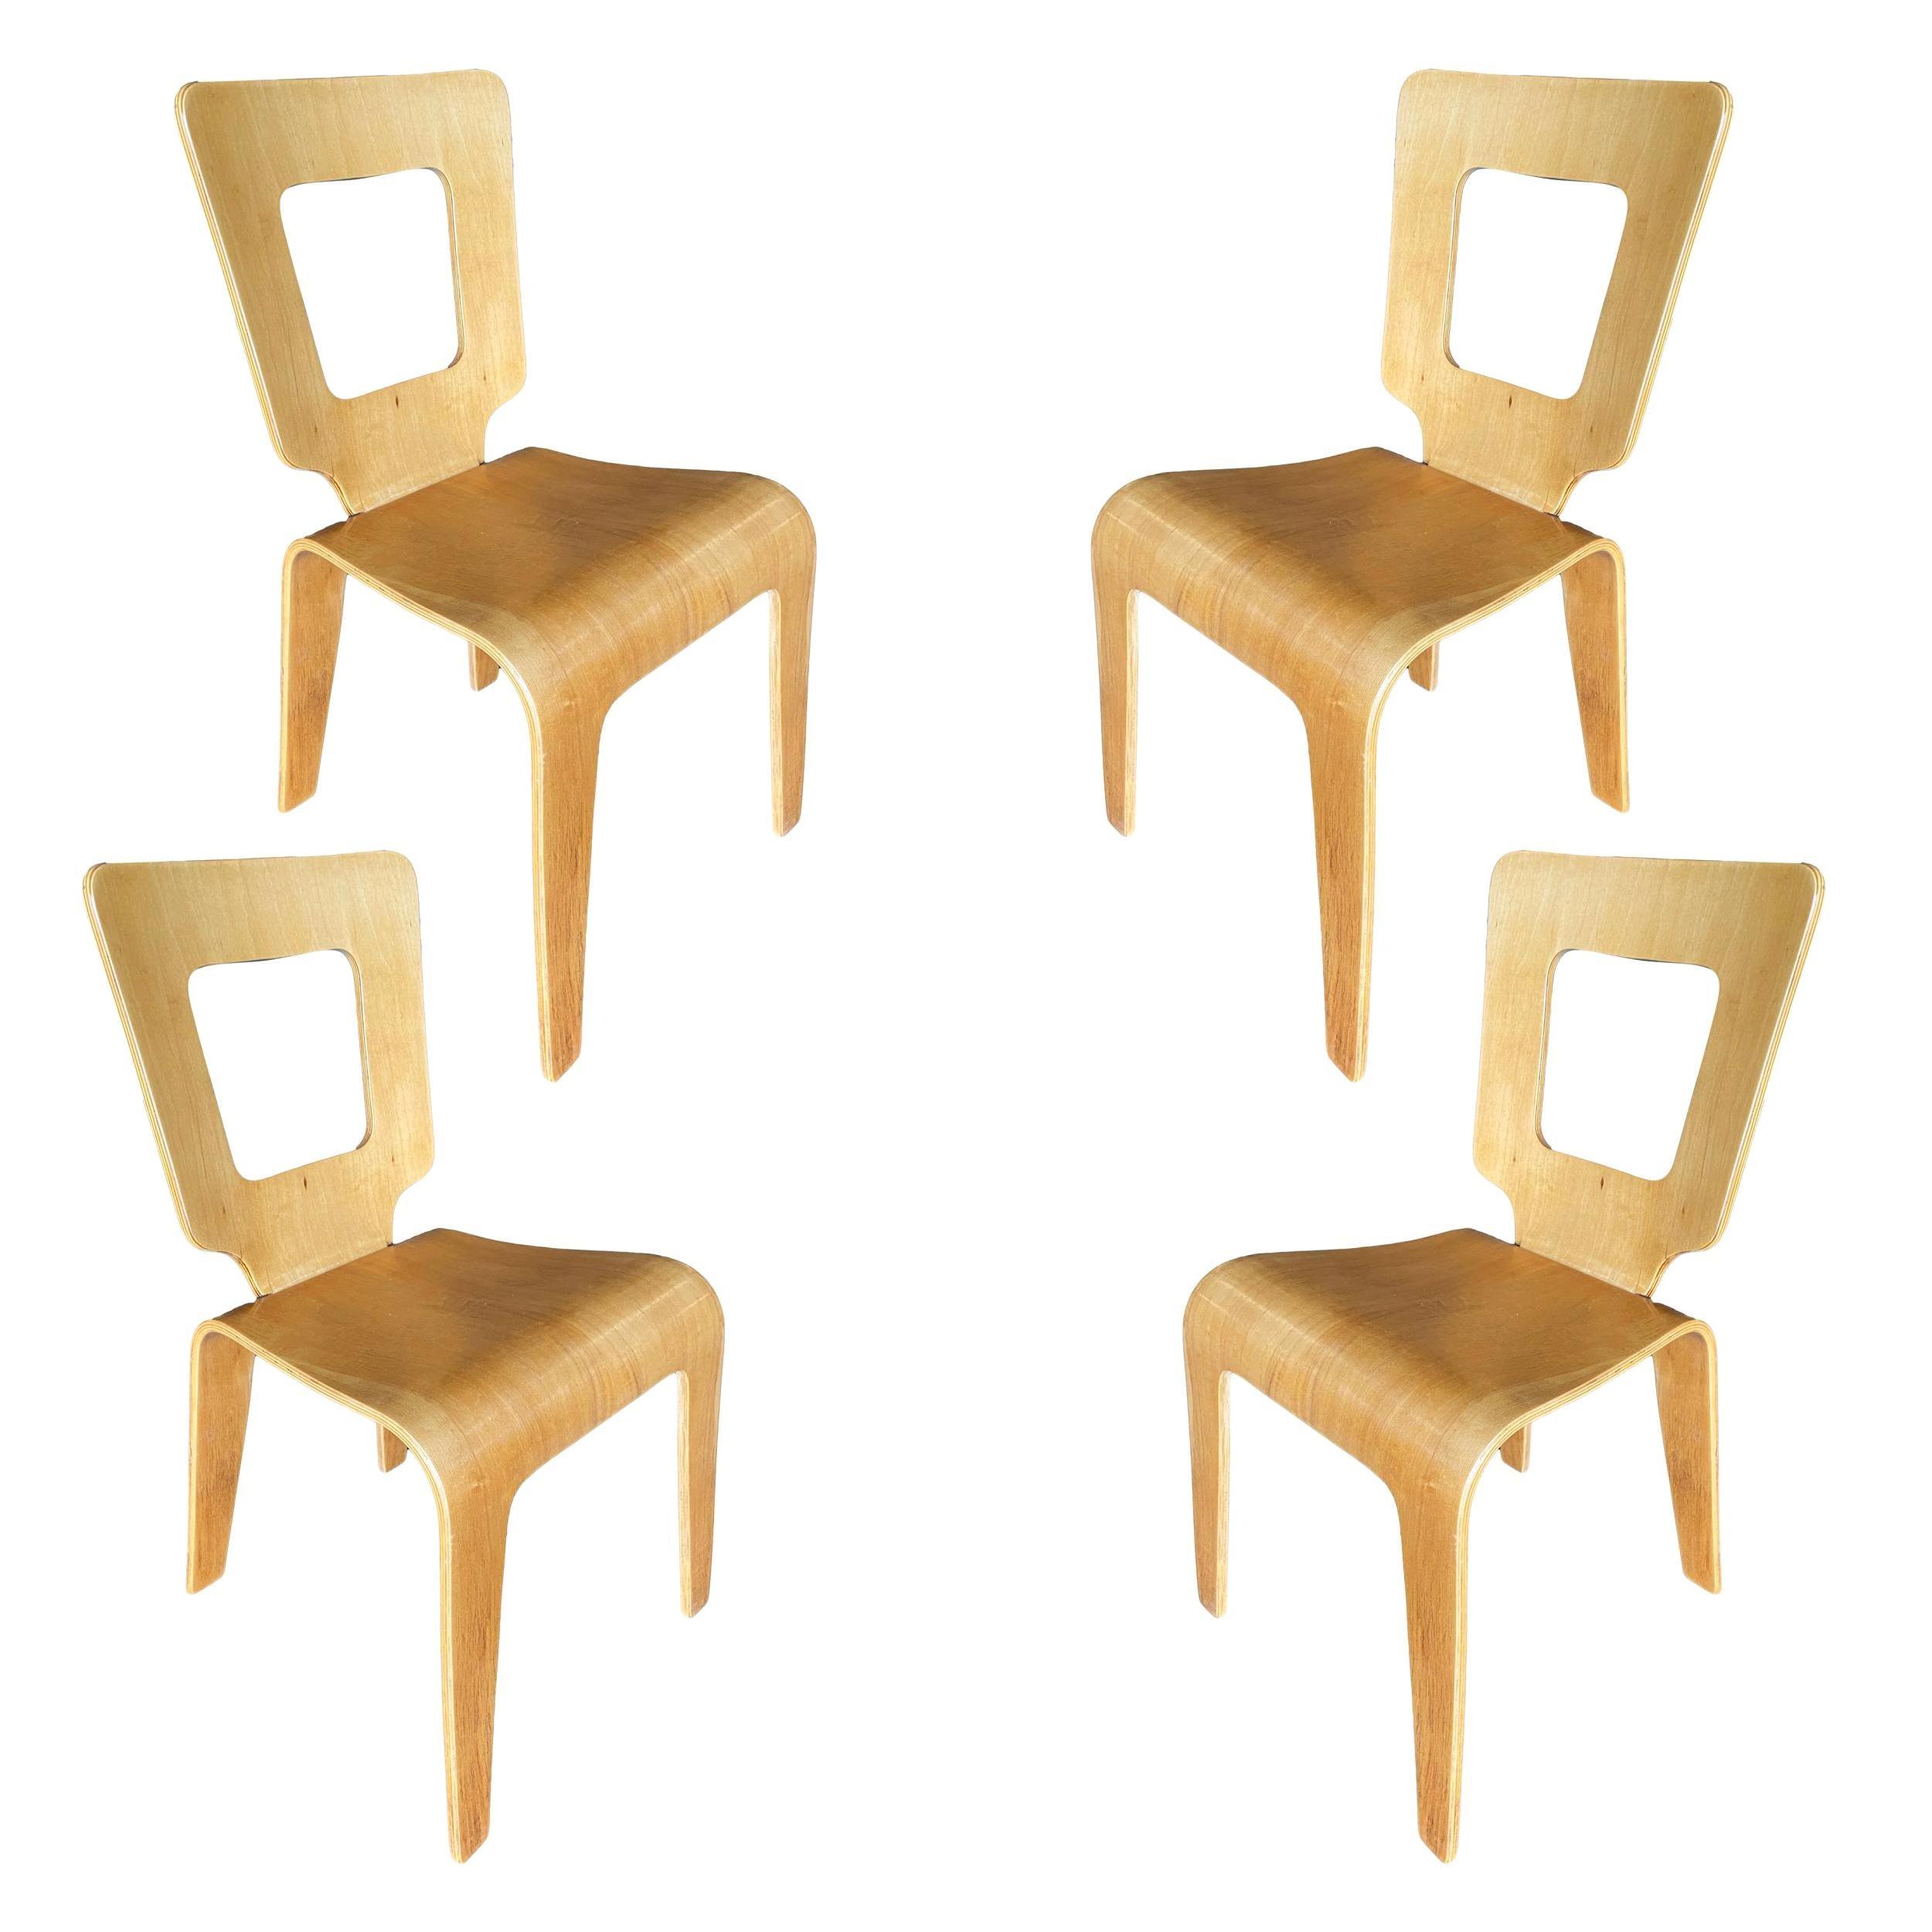 Rare Thaden-Jordan Furniture Bent Plywood Side Chairs, Set of 4